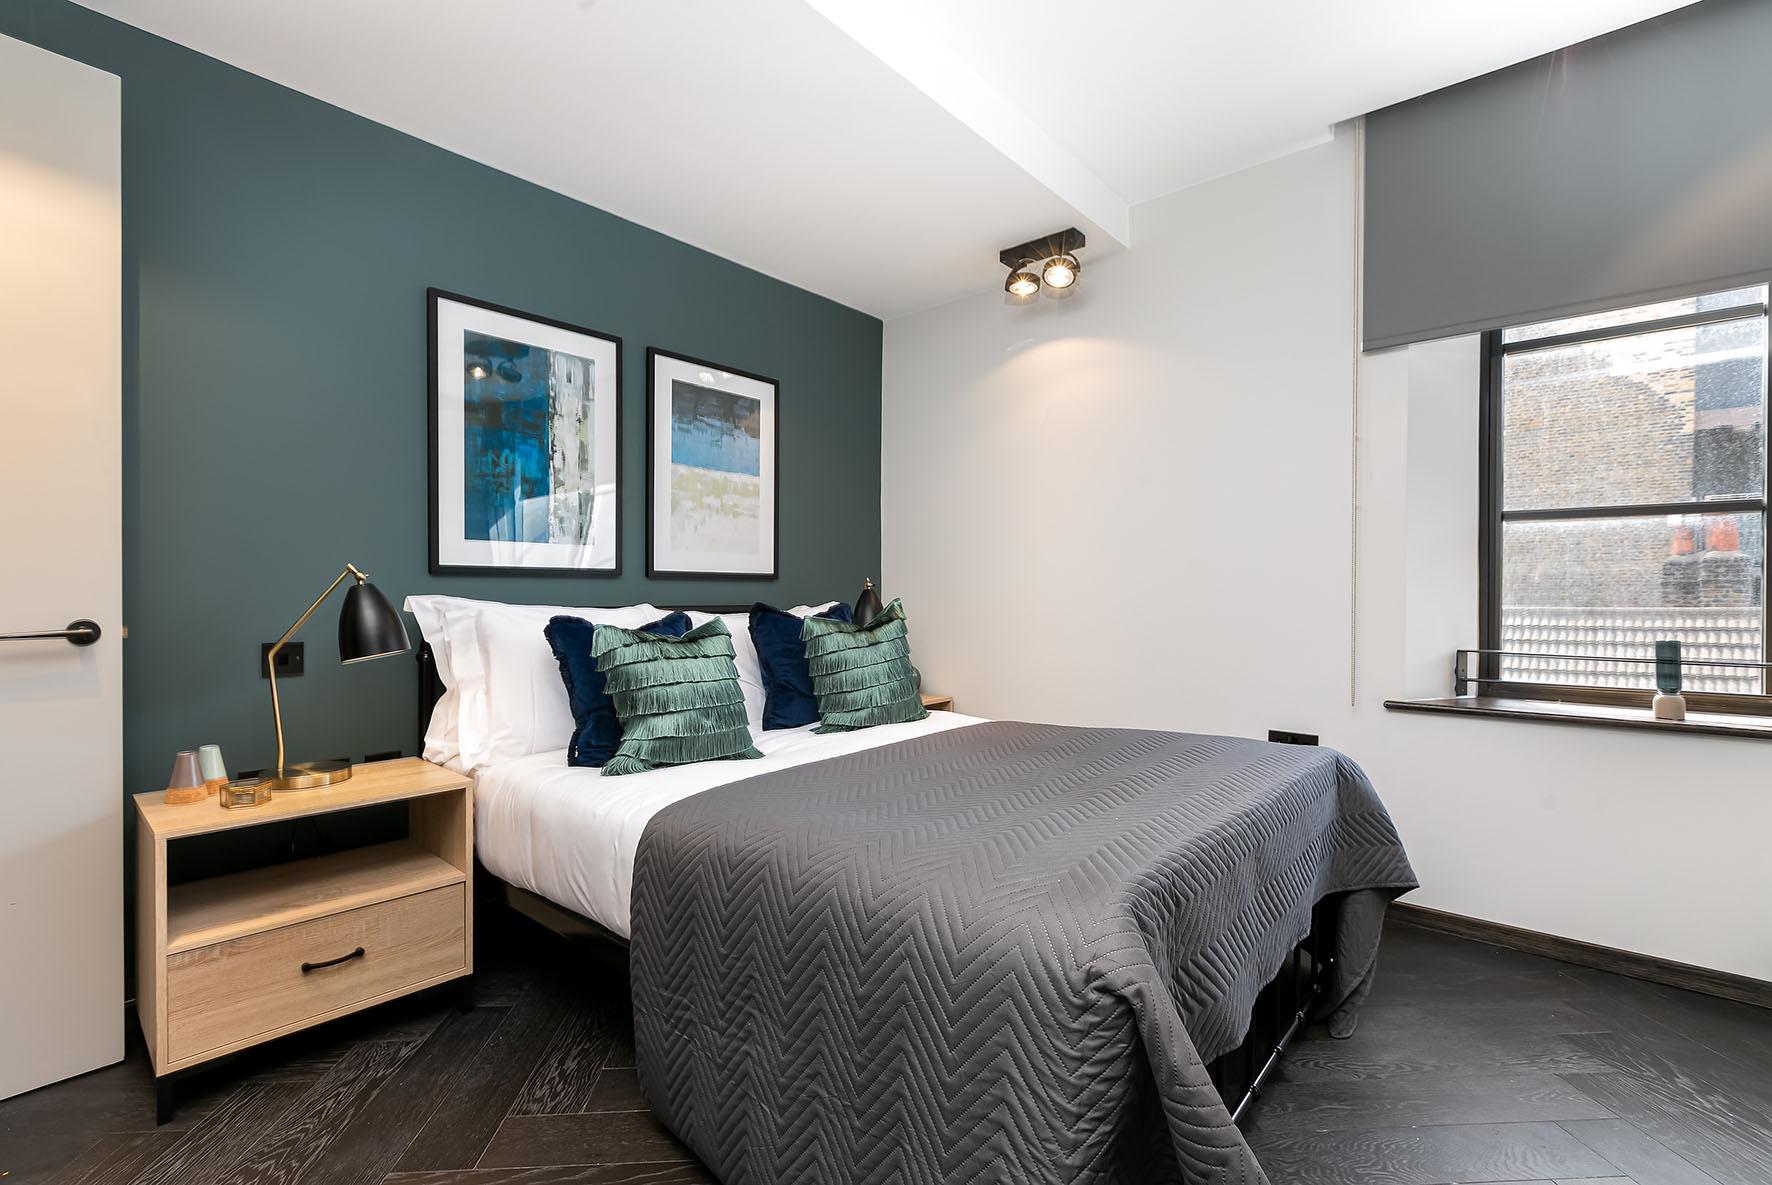 Lovelydays luxury service apartment rental - London - Soho - Noel Street VI - Lovelysuite - 2 bedrooms - 2 bathrooms - Queen bed - 90c4daa21618 - Lovelydays